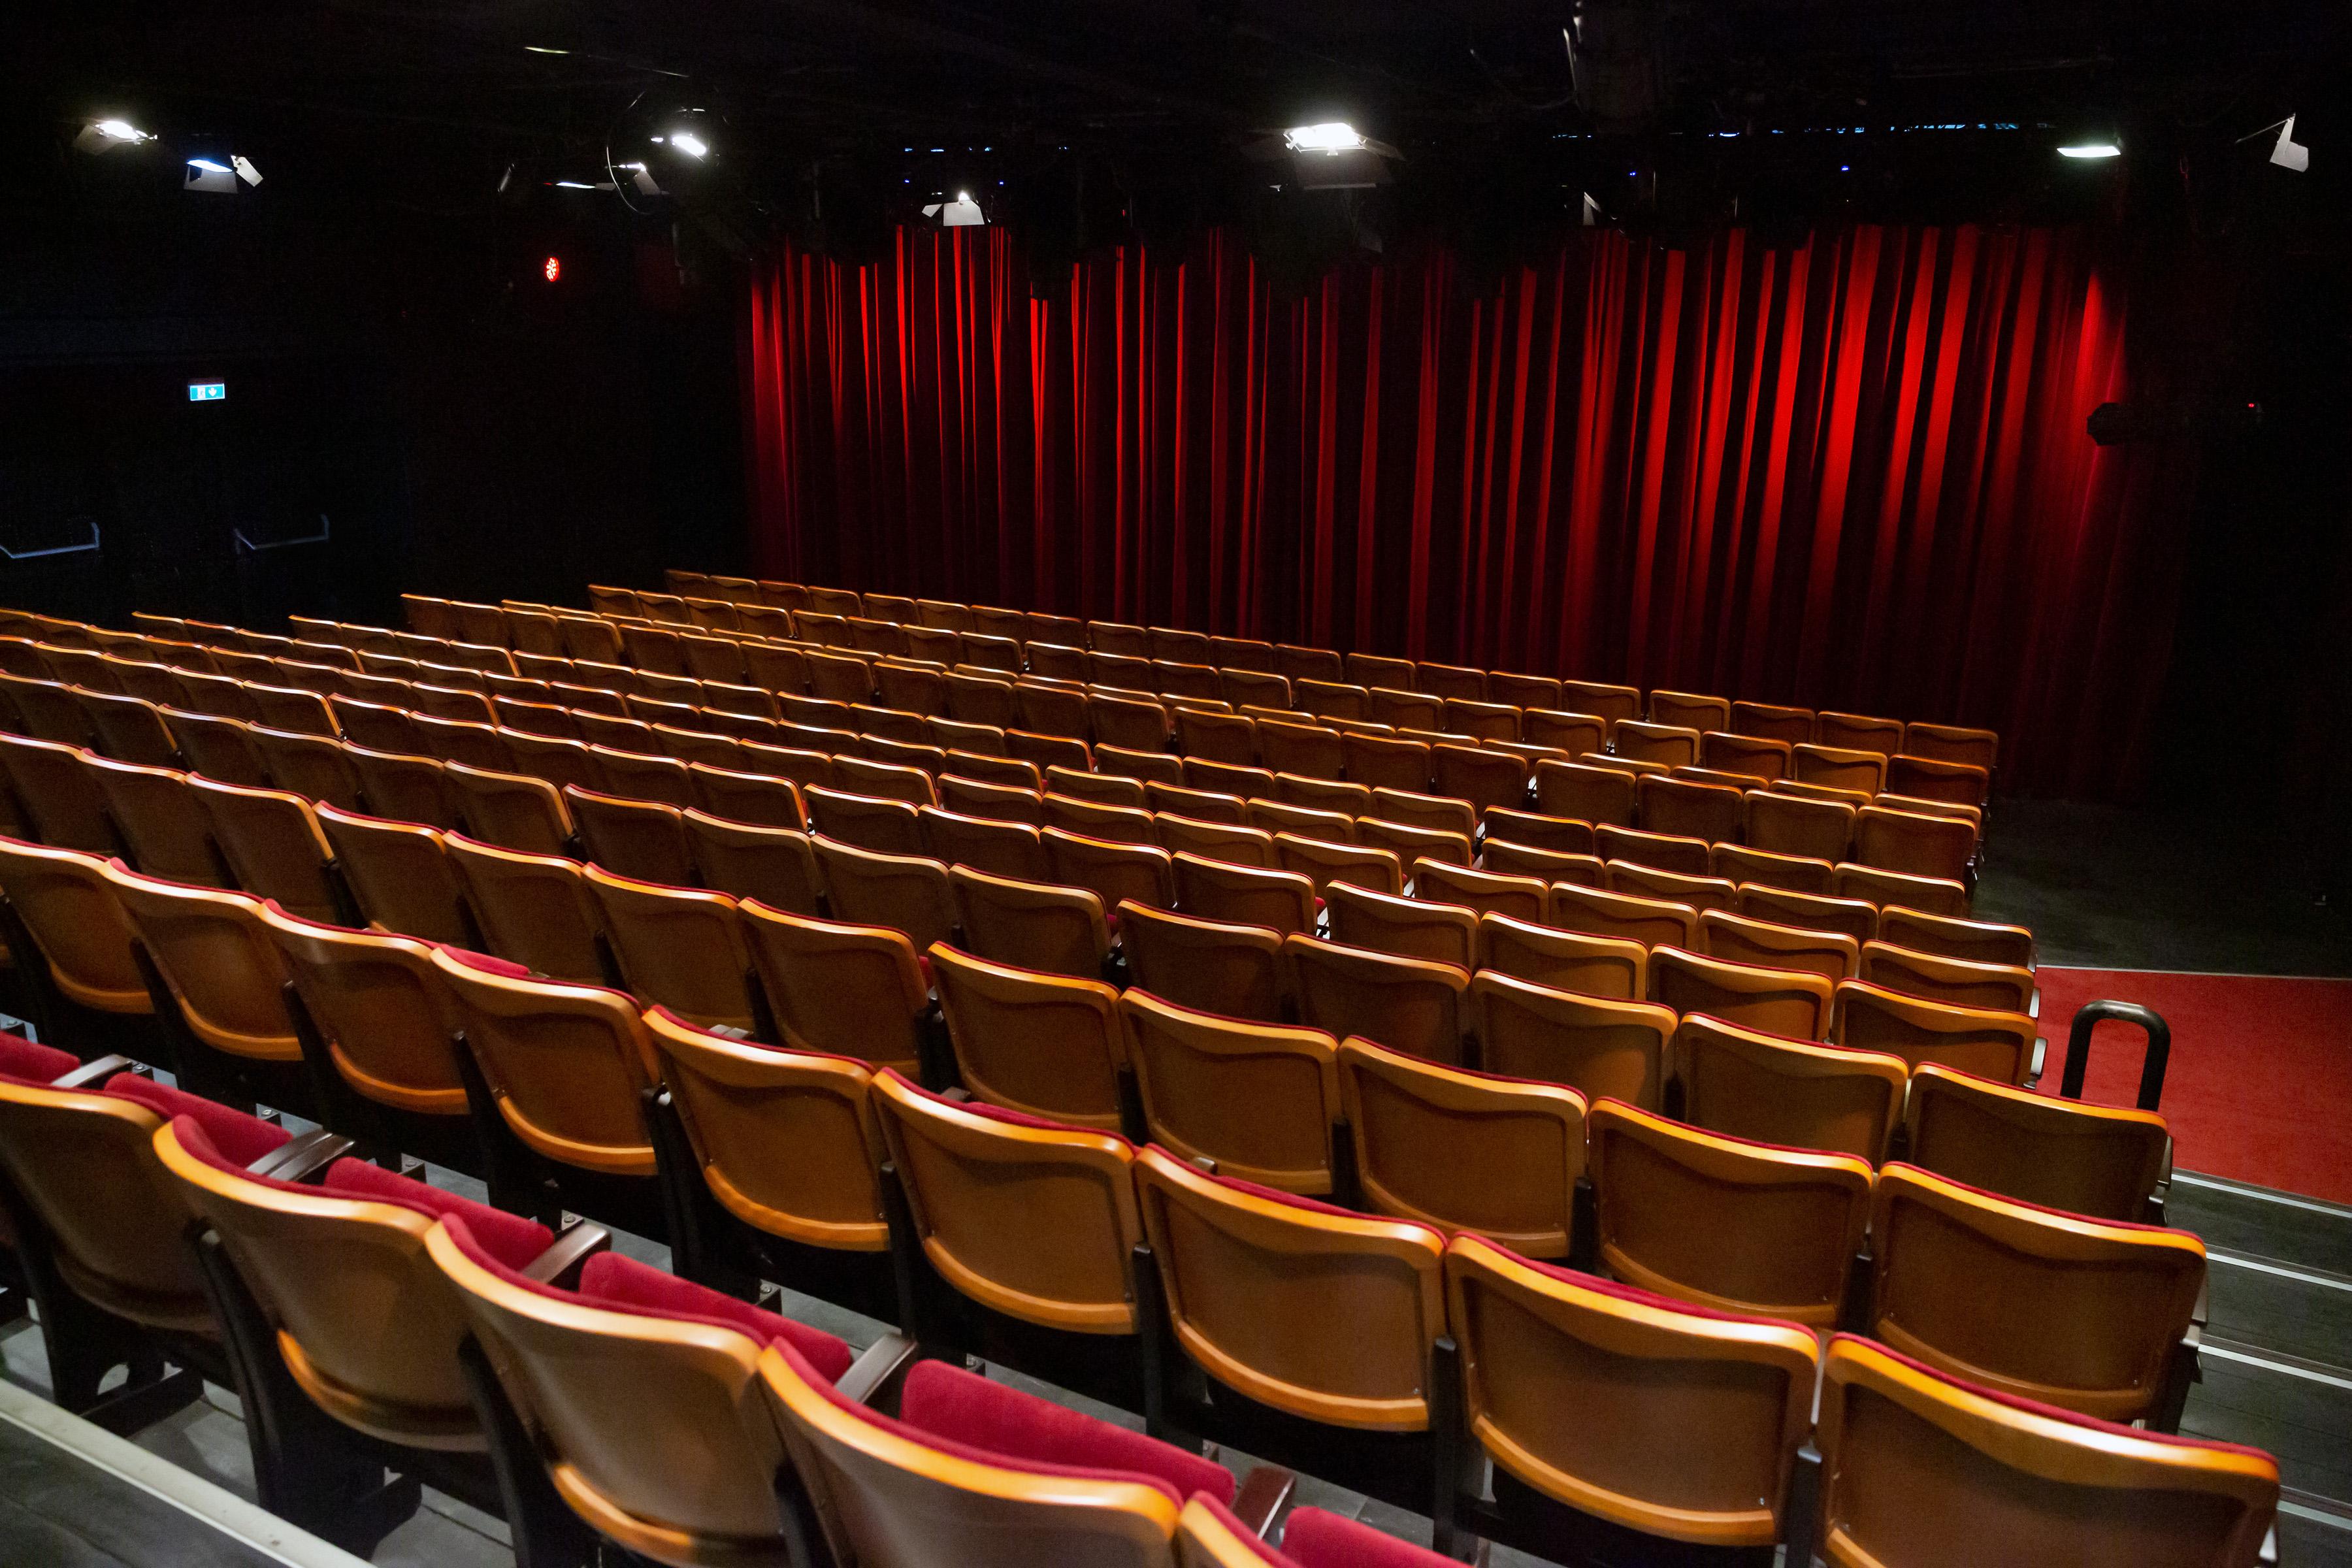 File:Rabenhof Theater 2019-02 d.jpg - Wikimedia Commons